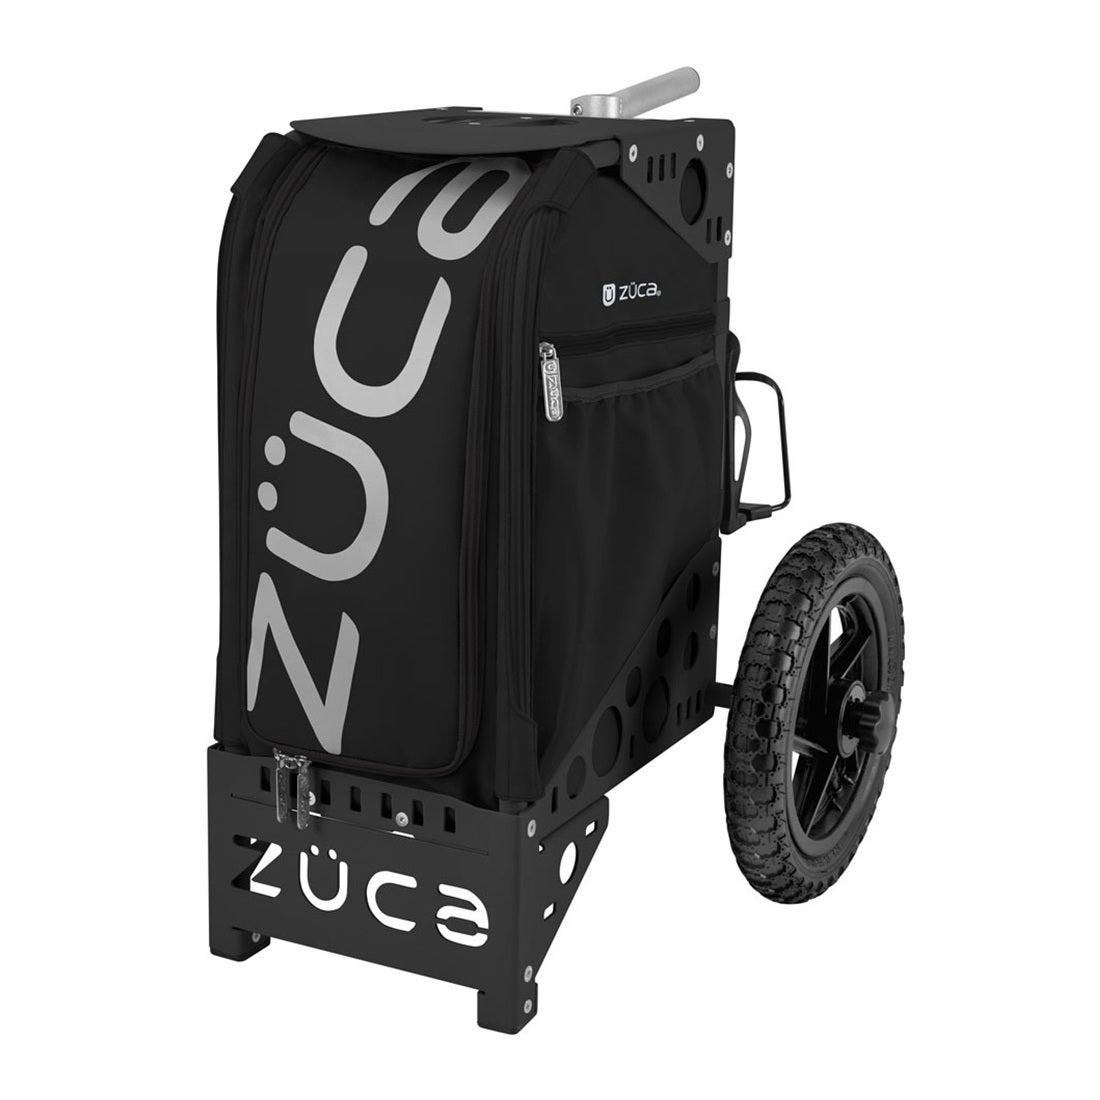 【SAC'S BAR】ズーカ ZUCA キャリーケース 1310 ALL-TERRAIN Onyx/Black メンズ